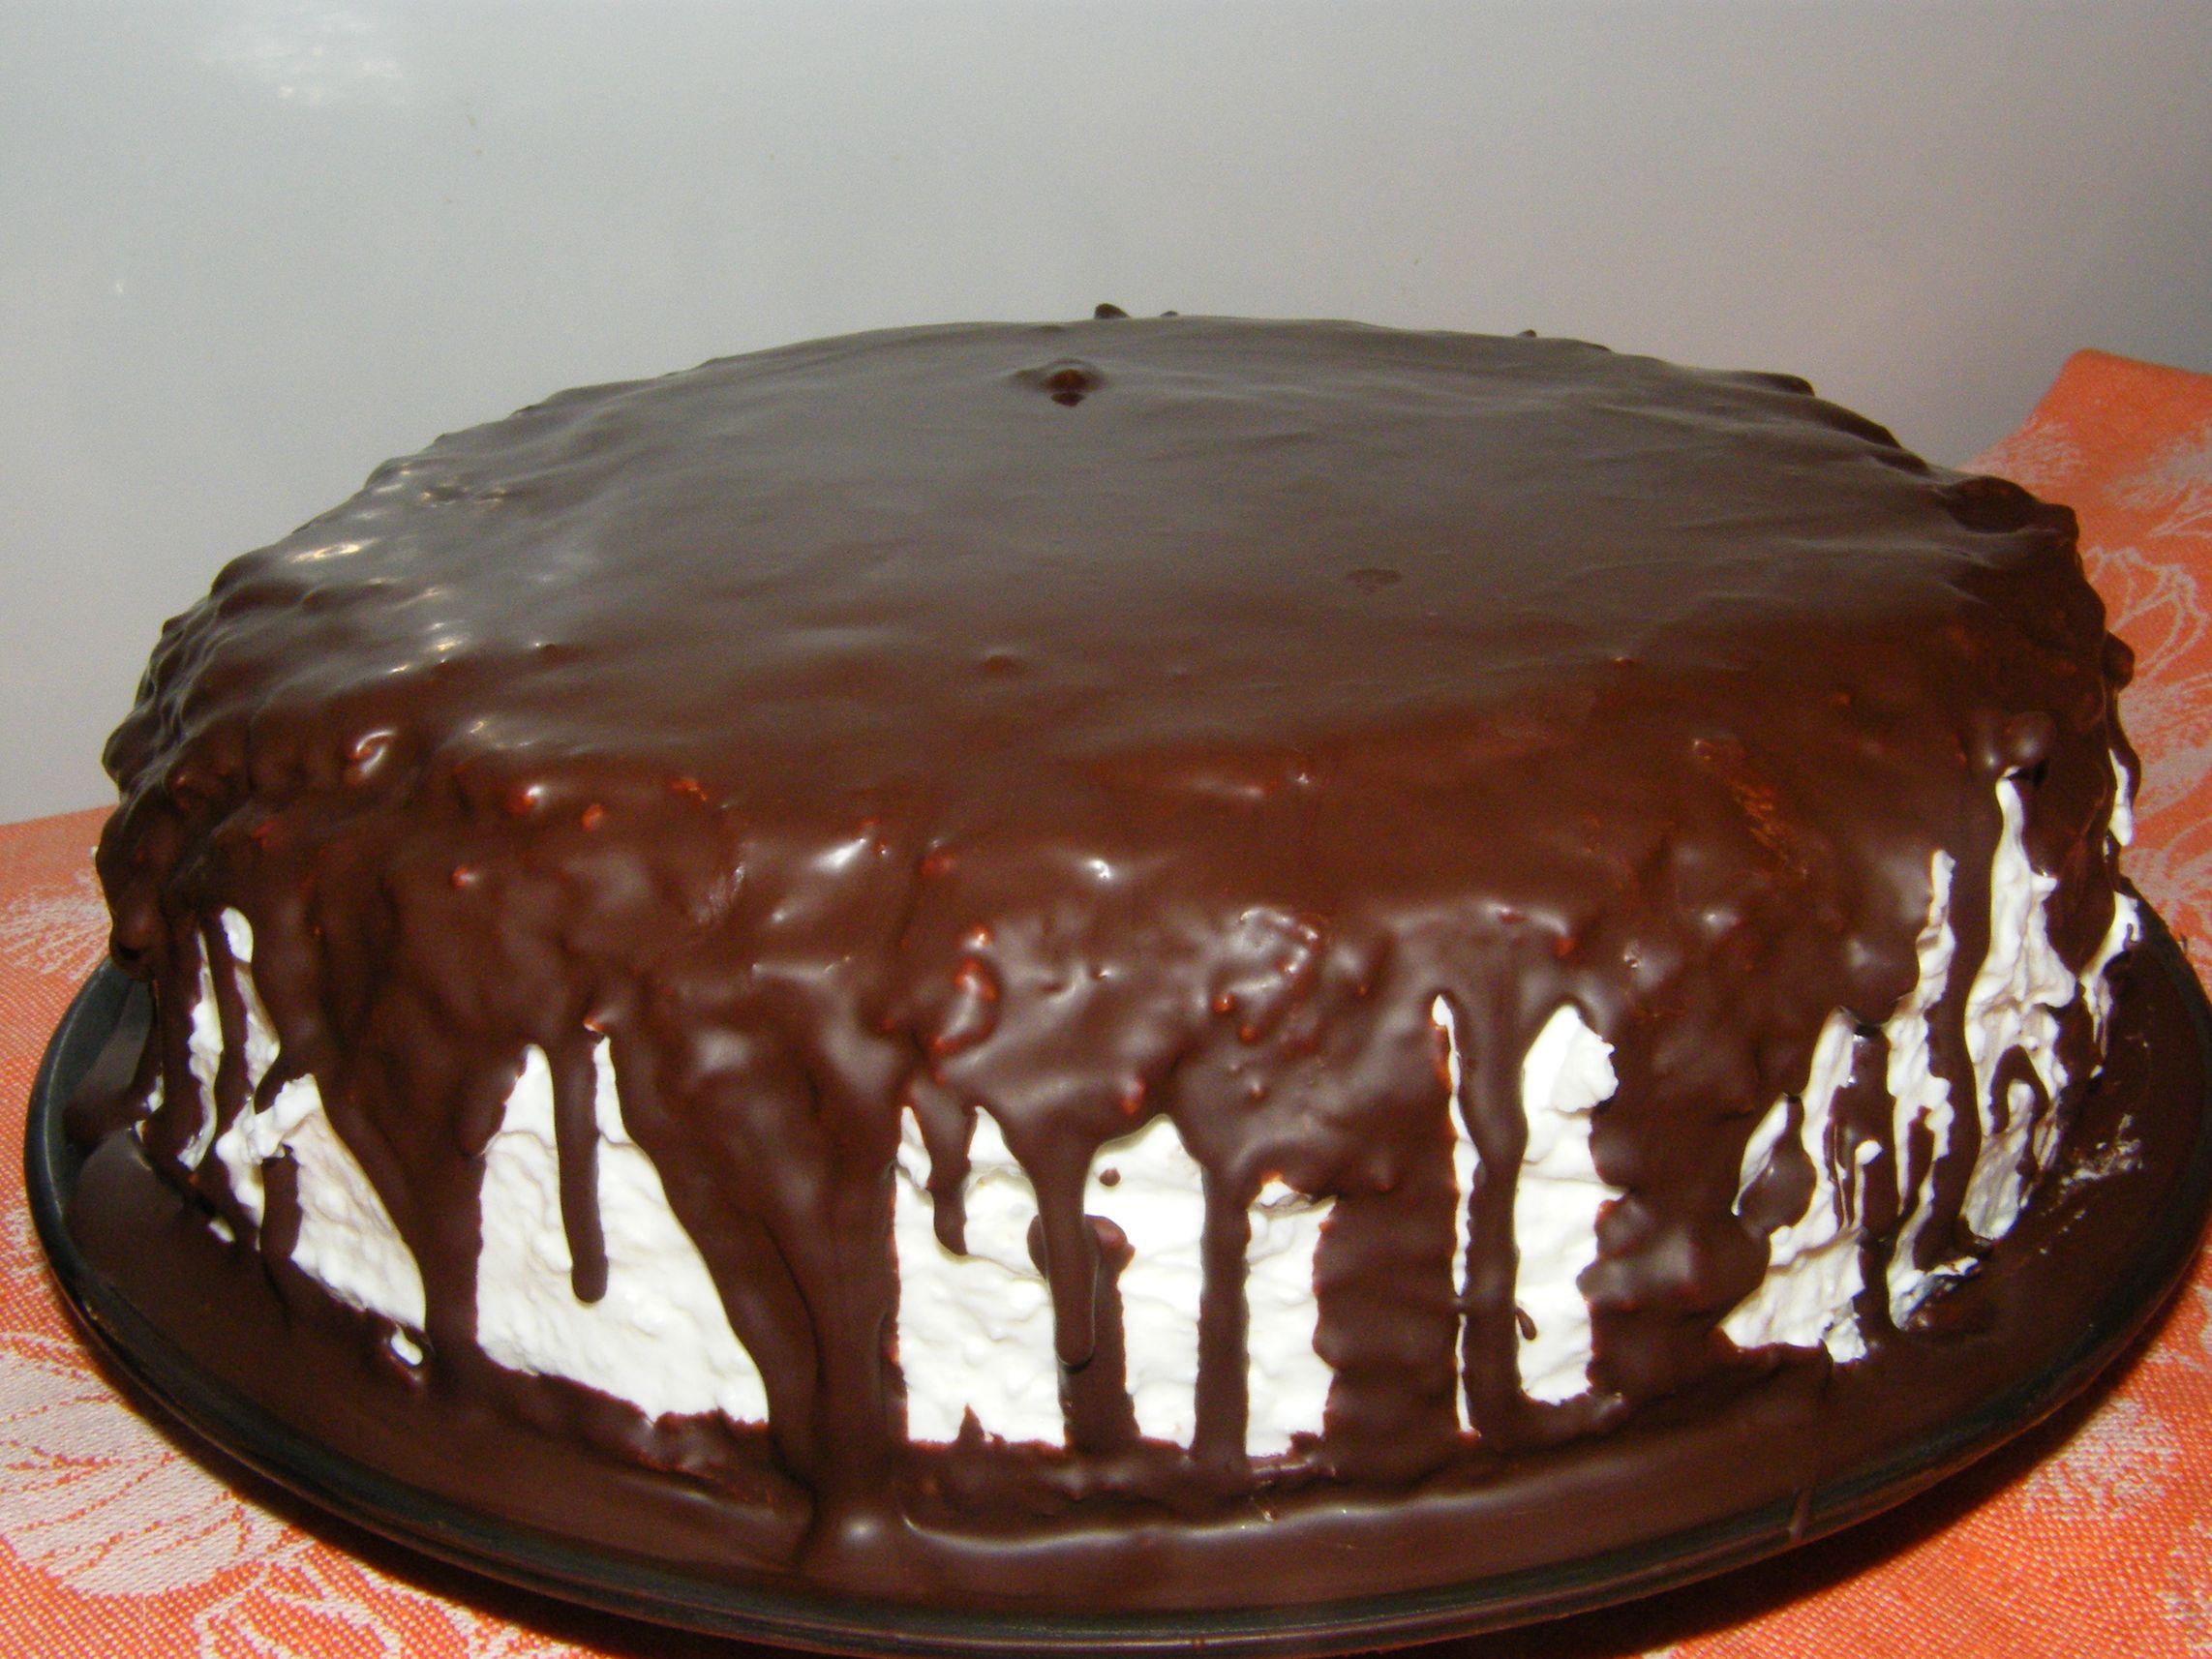 turo_rudi_torta_3_.JPG